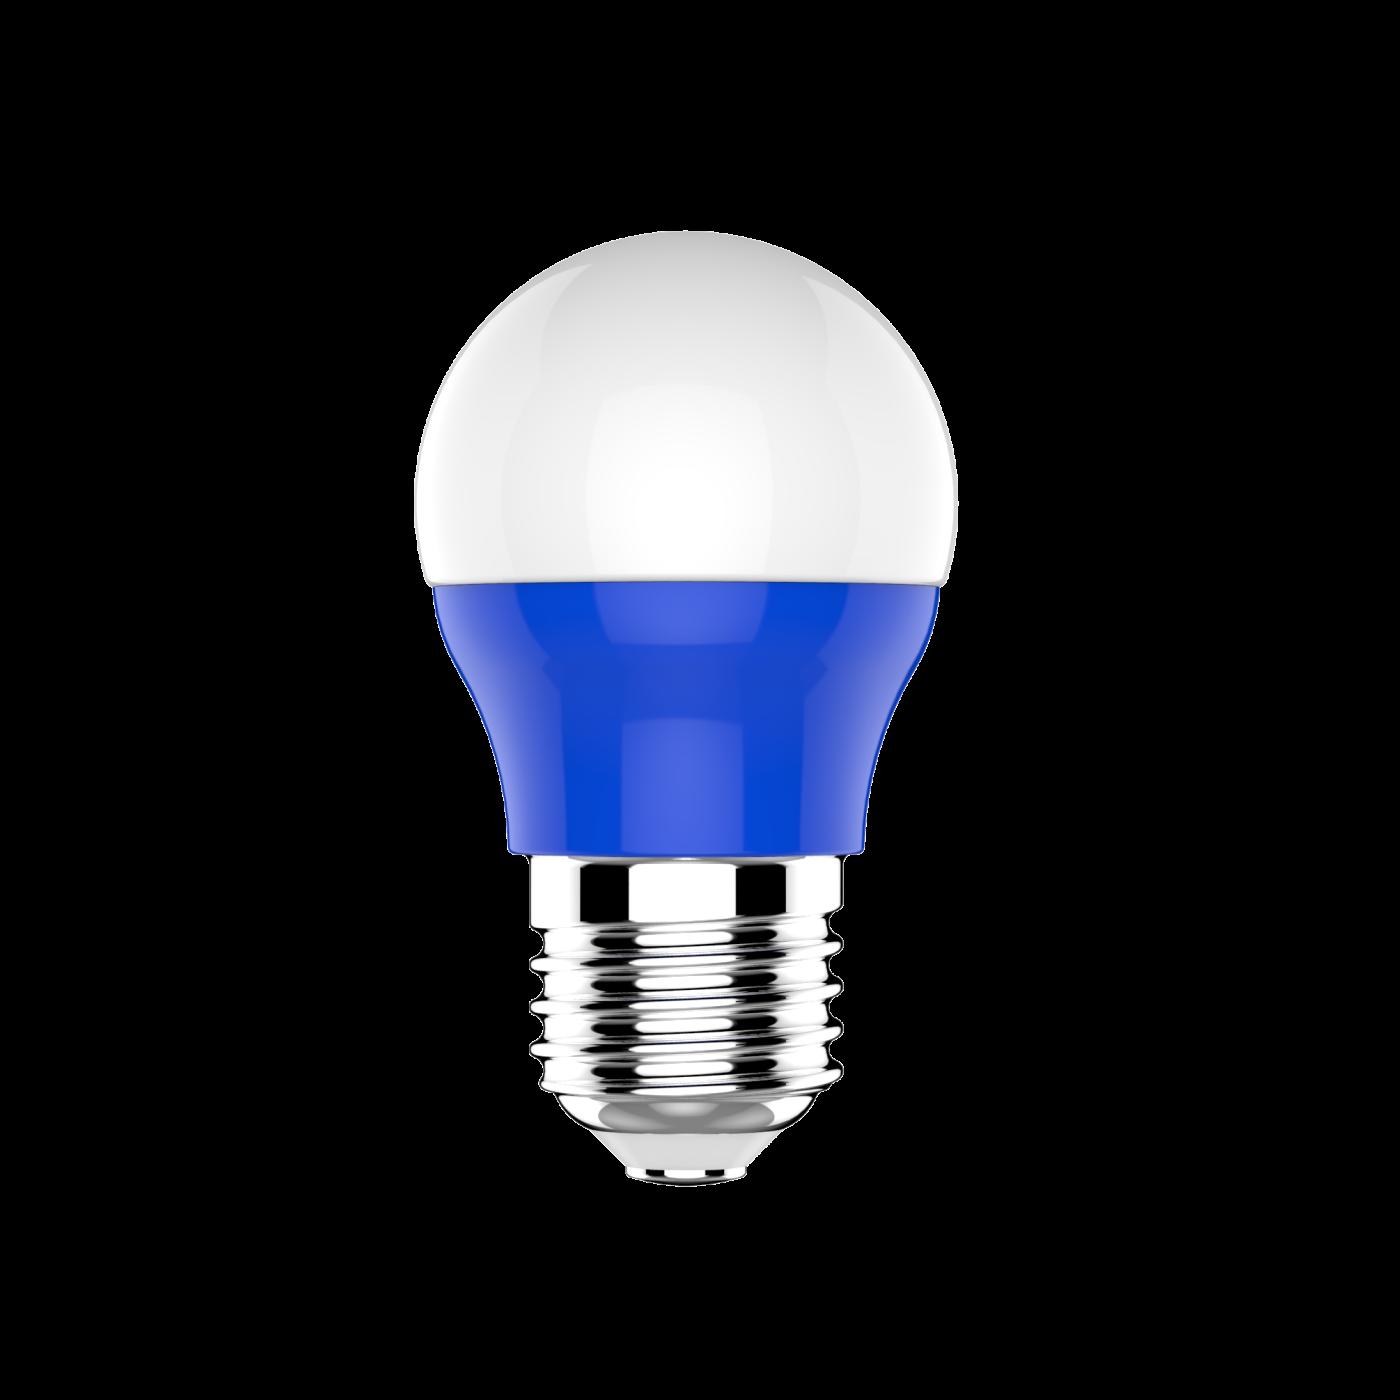 5_Watt_LED_Bulb_E27_Screw_Caps_Type_Bulb_In_Pakistan